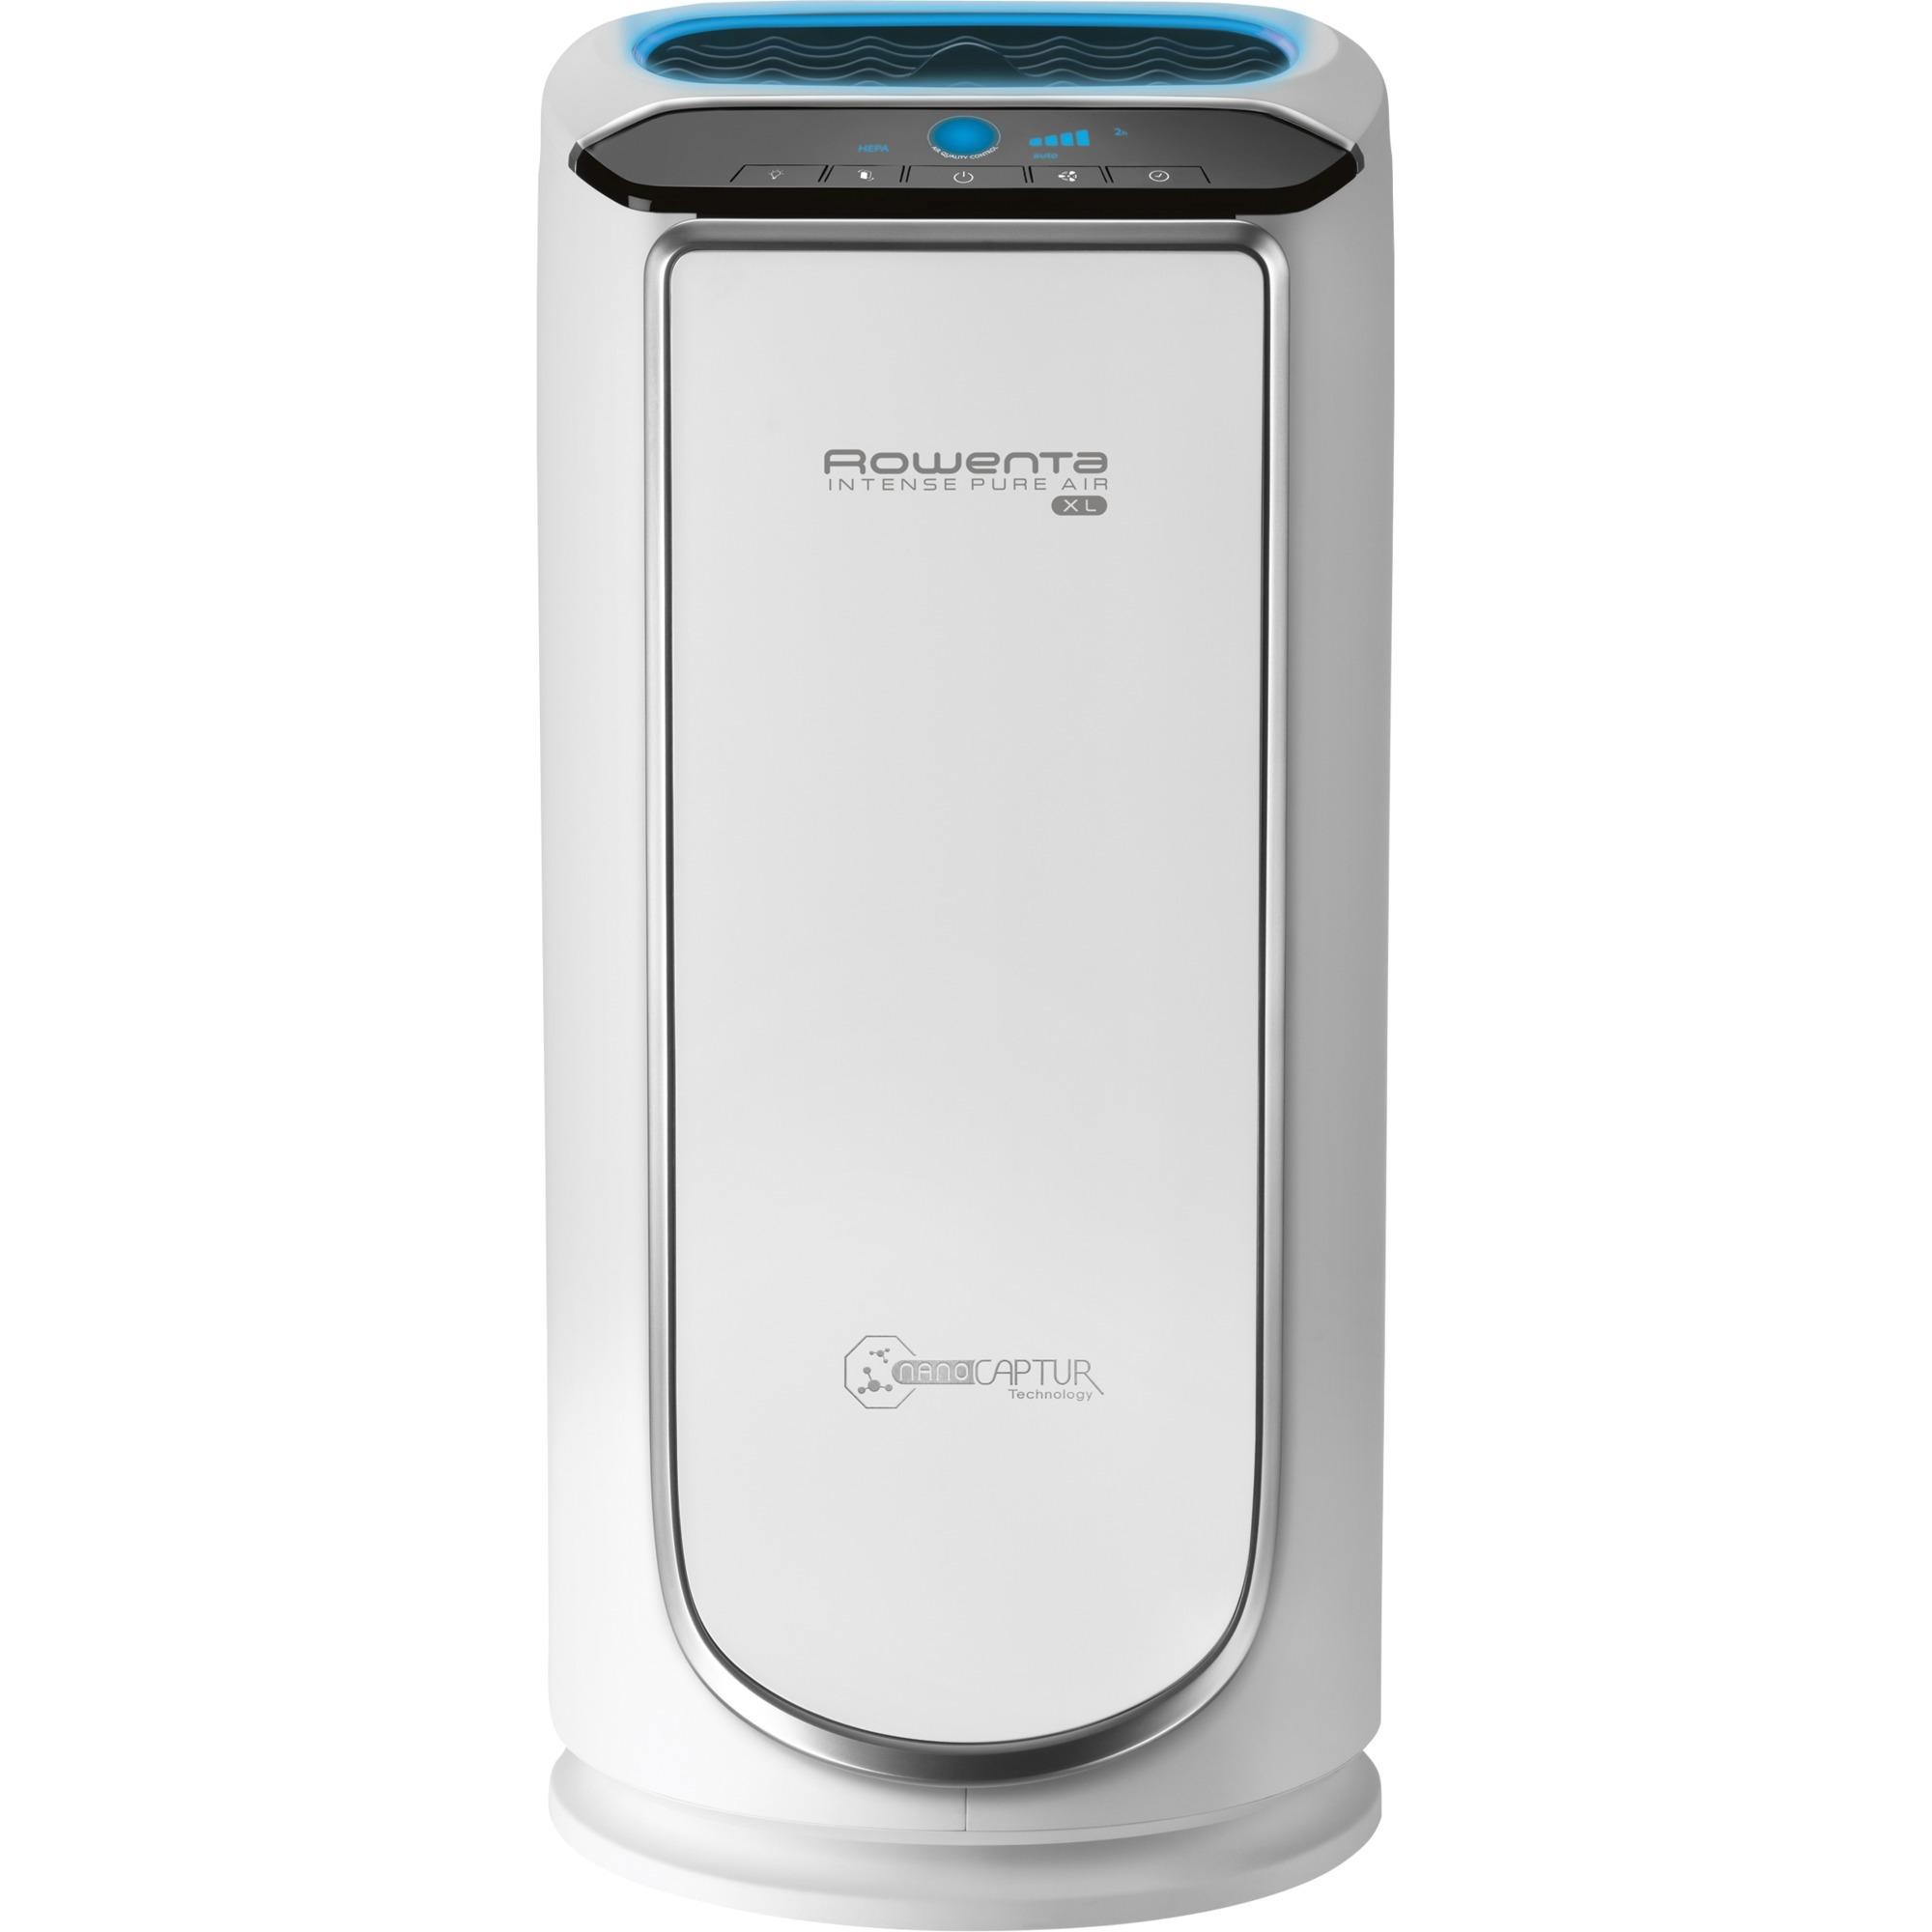 Intense PU6020 purificador de aire 80 m2 52 dB Plata, Blanco 75 W